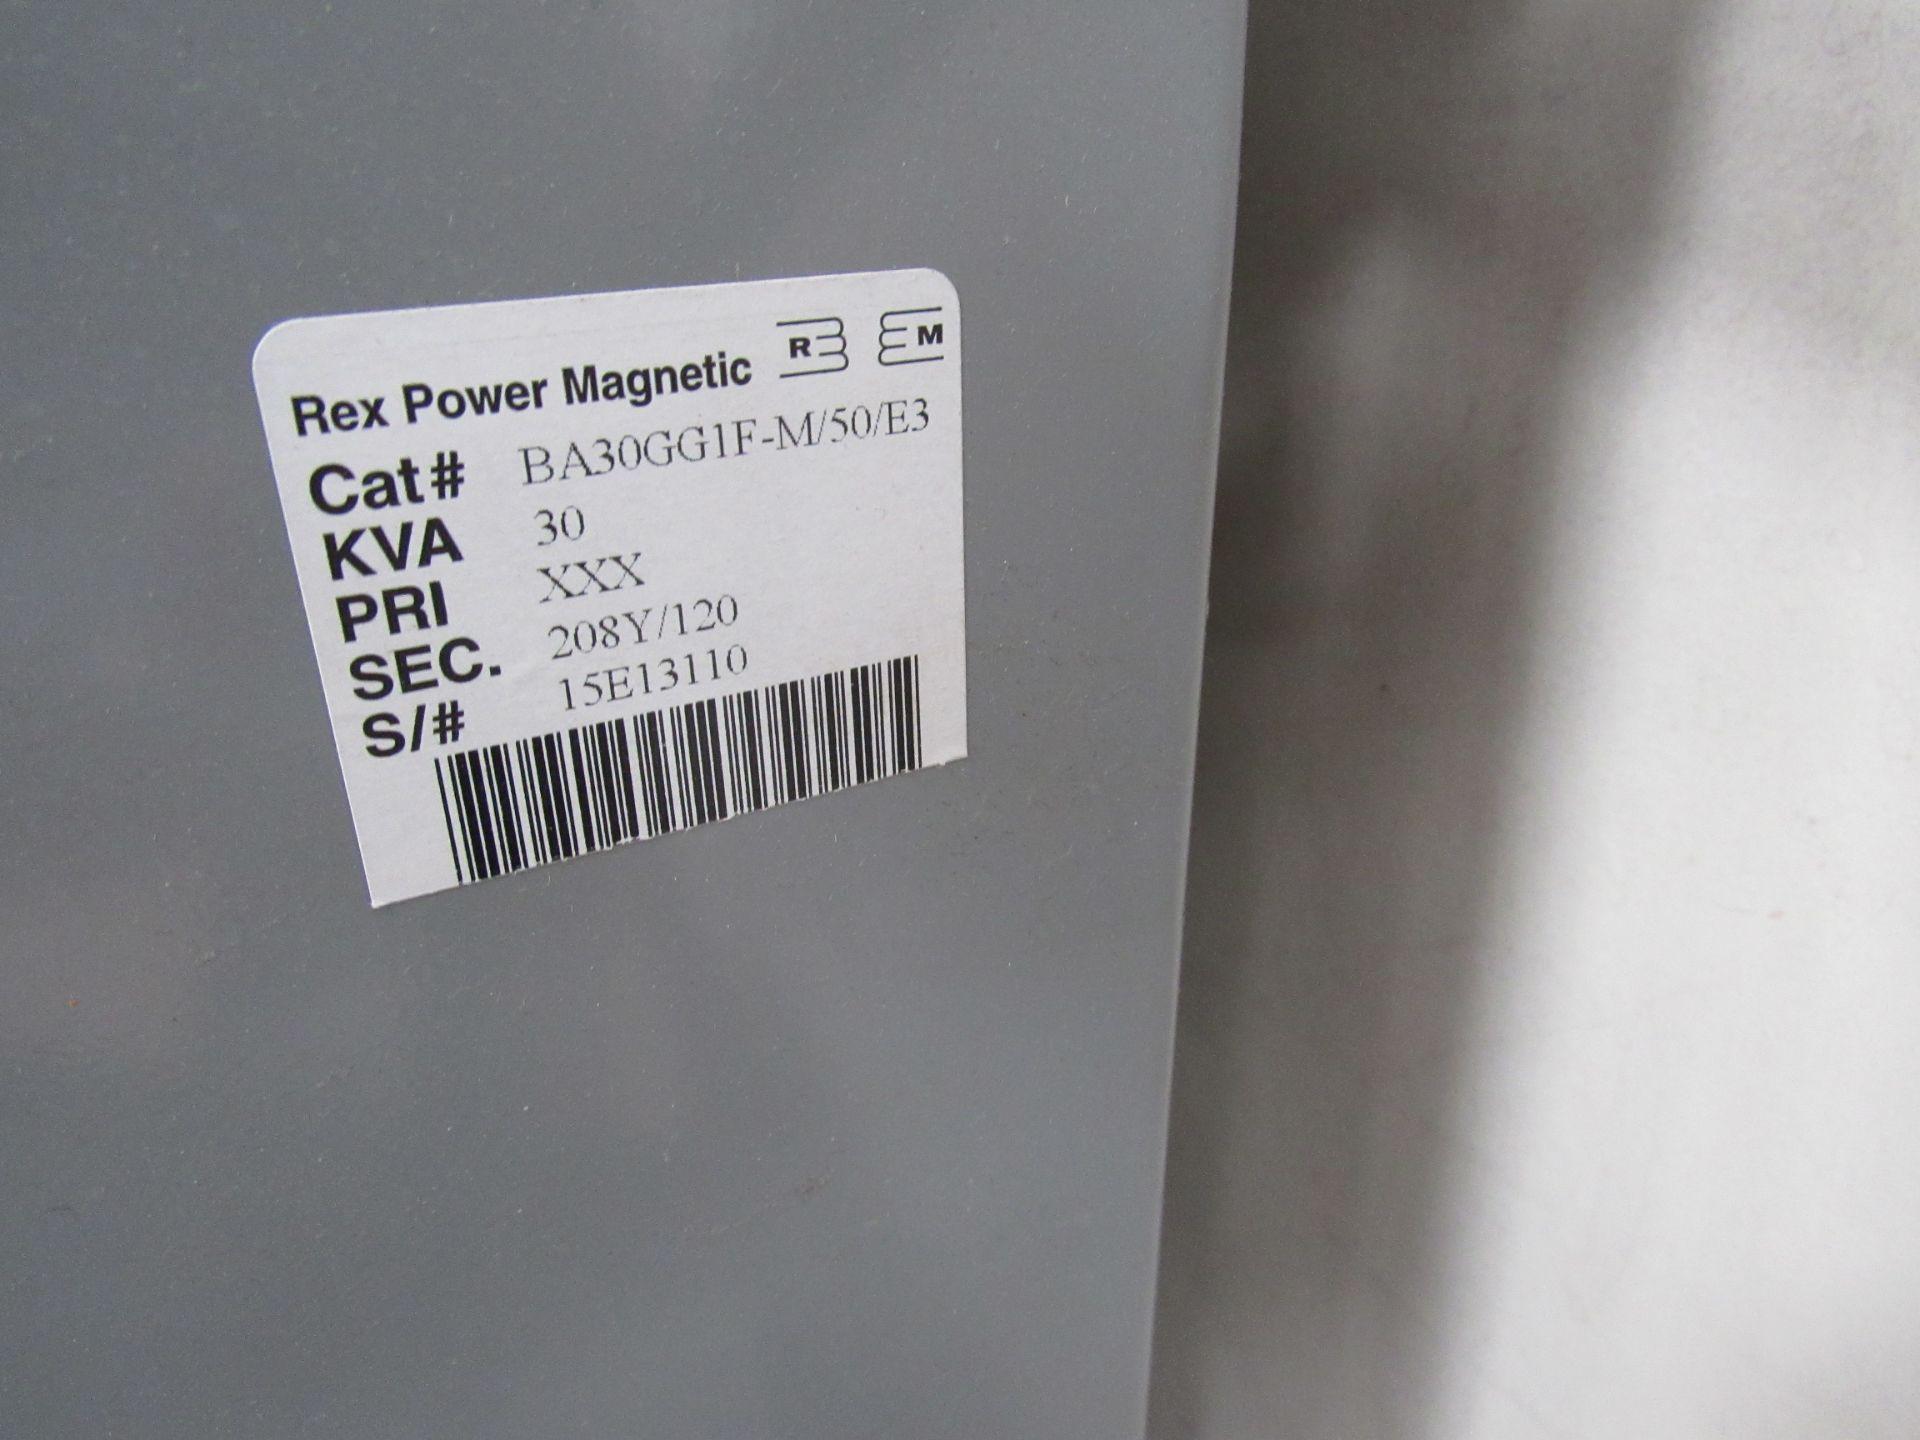 Rex Power Magnetic 30KVA 208Y/120Tranformer Serial Number 15E13110 Cat #, BA30GG1F-M/50/E3 - Image 3 of 4